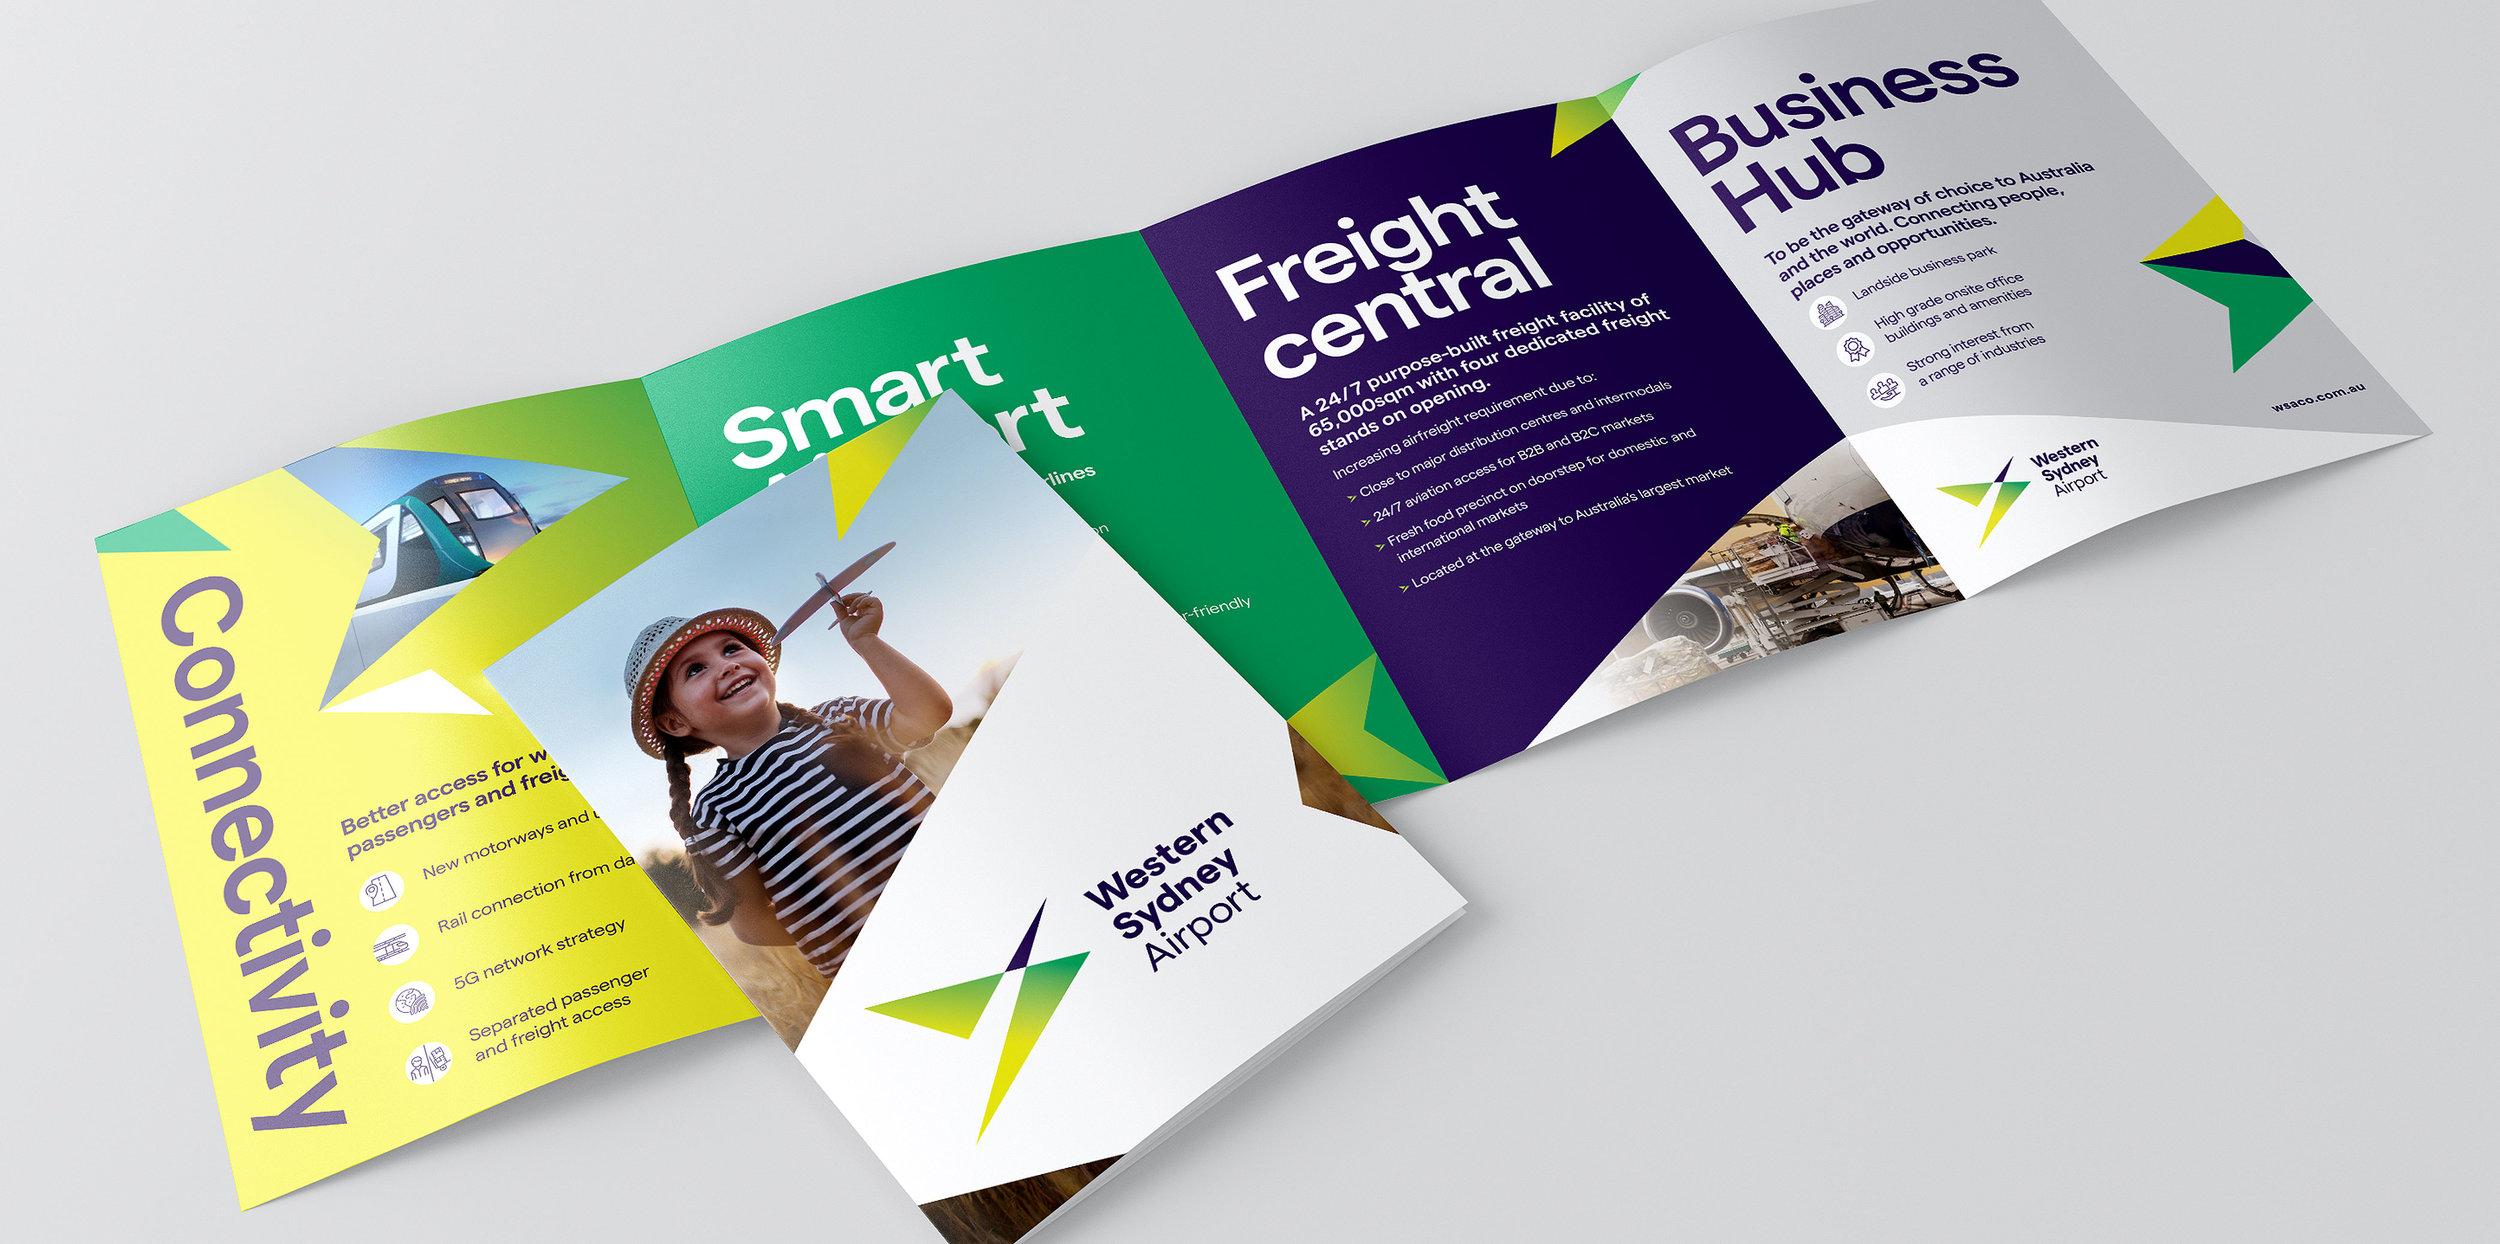 WSACO_A5-Double-Gatefold-Brochure-Design-Western-Sydney-Airport_4A.jpg